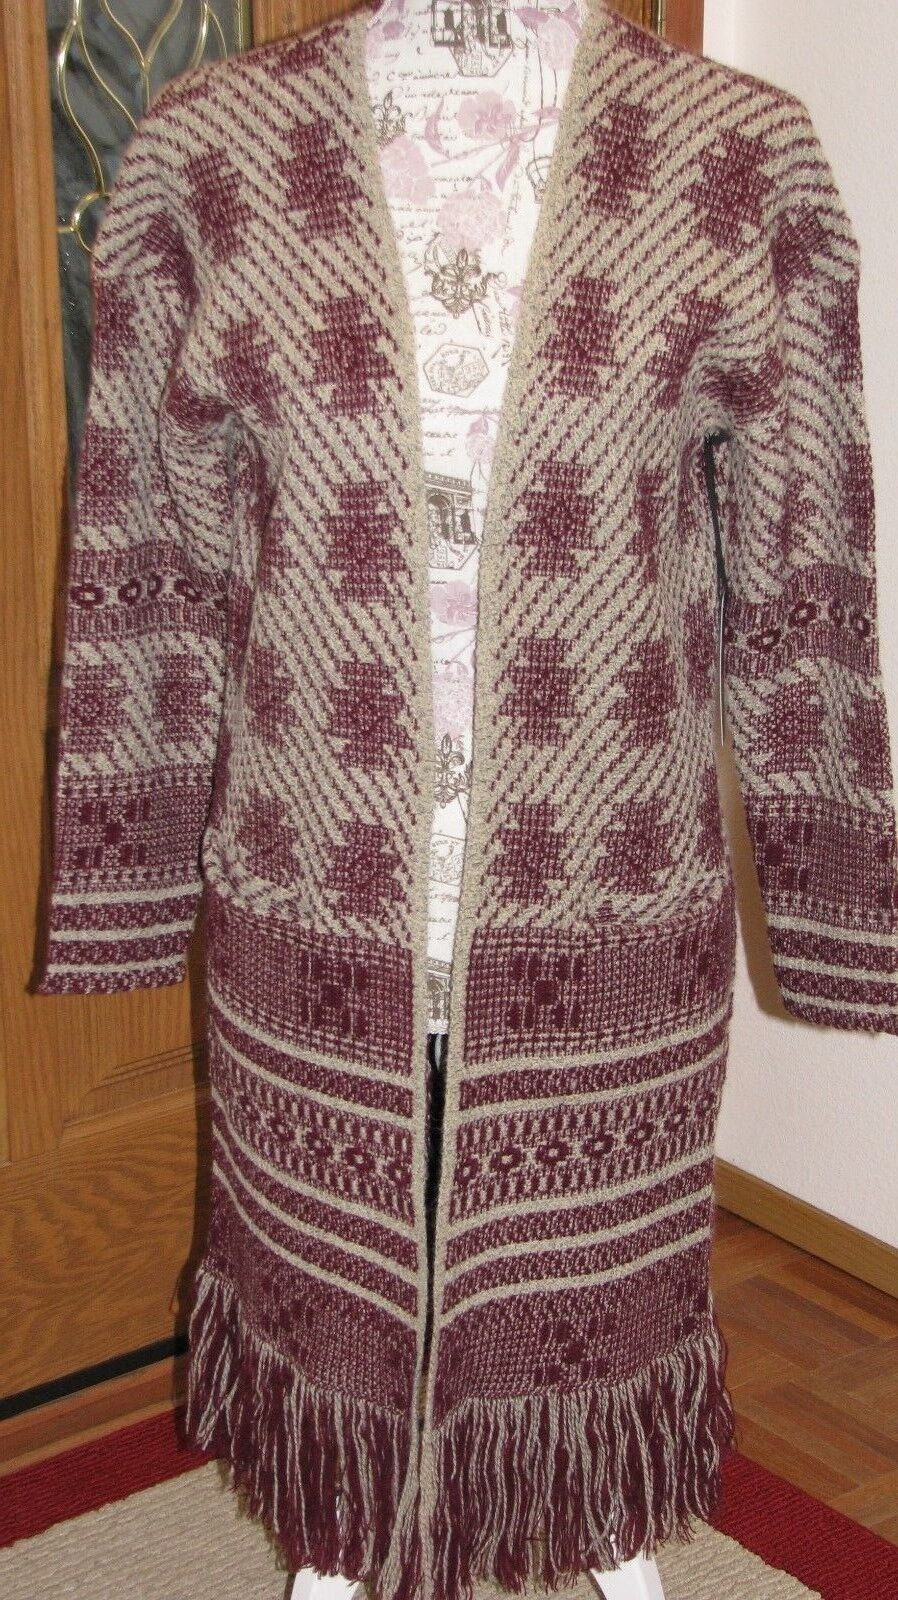 MaxSport Women's Medium Long Open Cardigan Cardigan Cardigan Oatmeal Burgandy Duster Sweater 0f1240